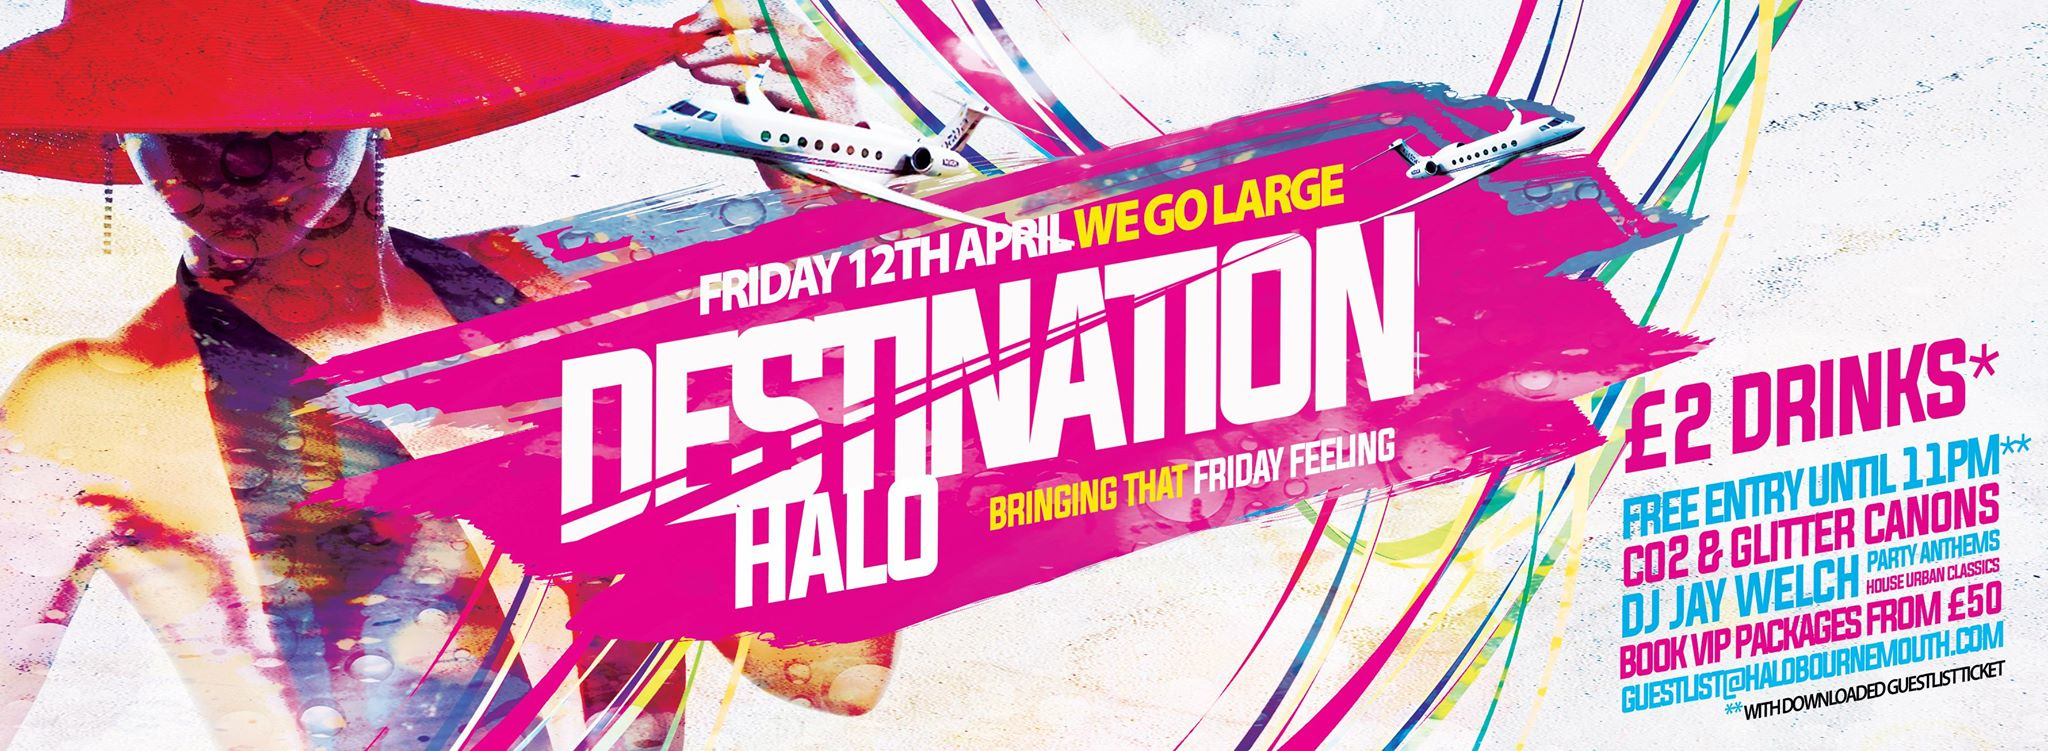 Destination Halo 12.04.19